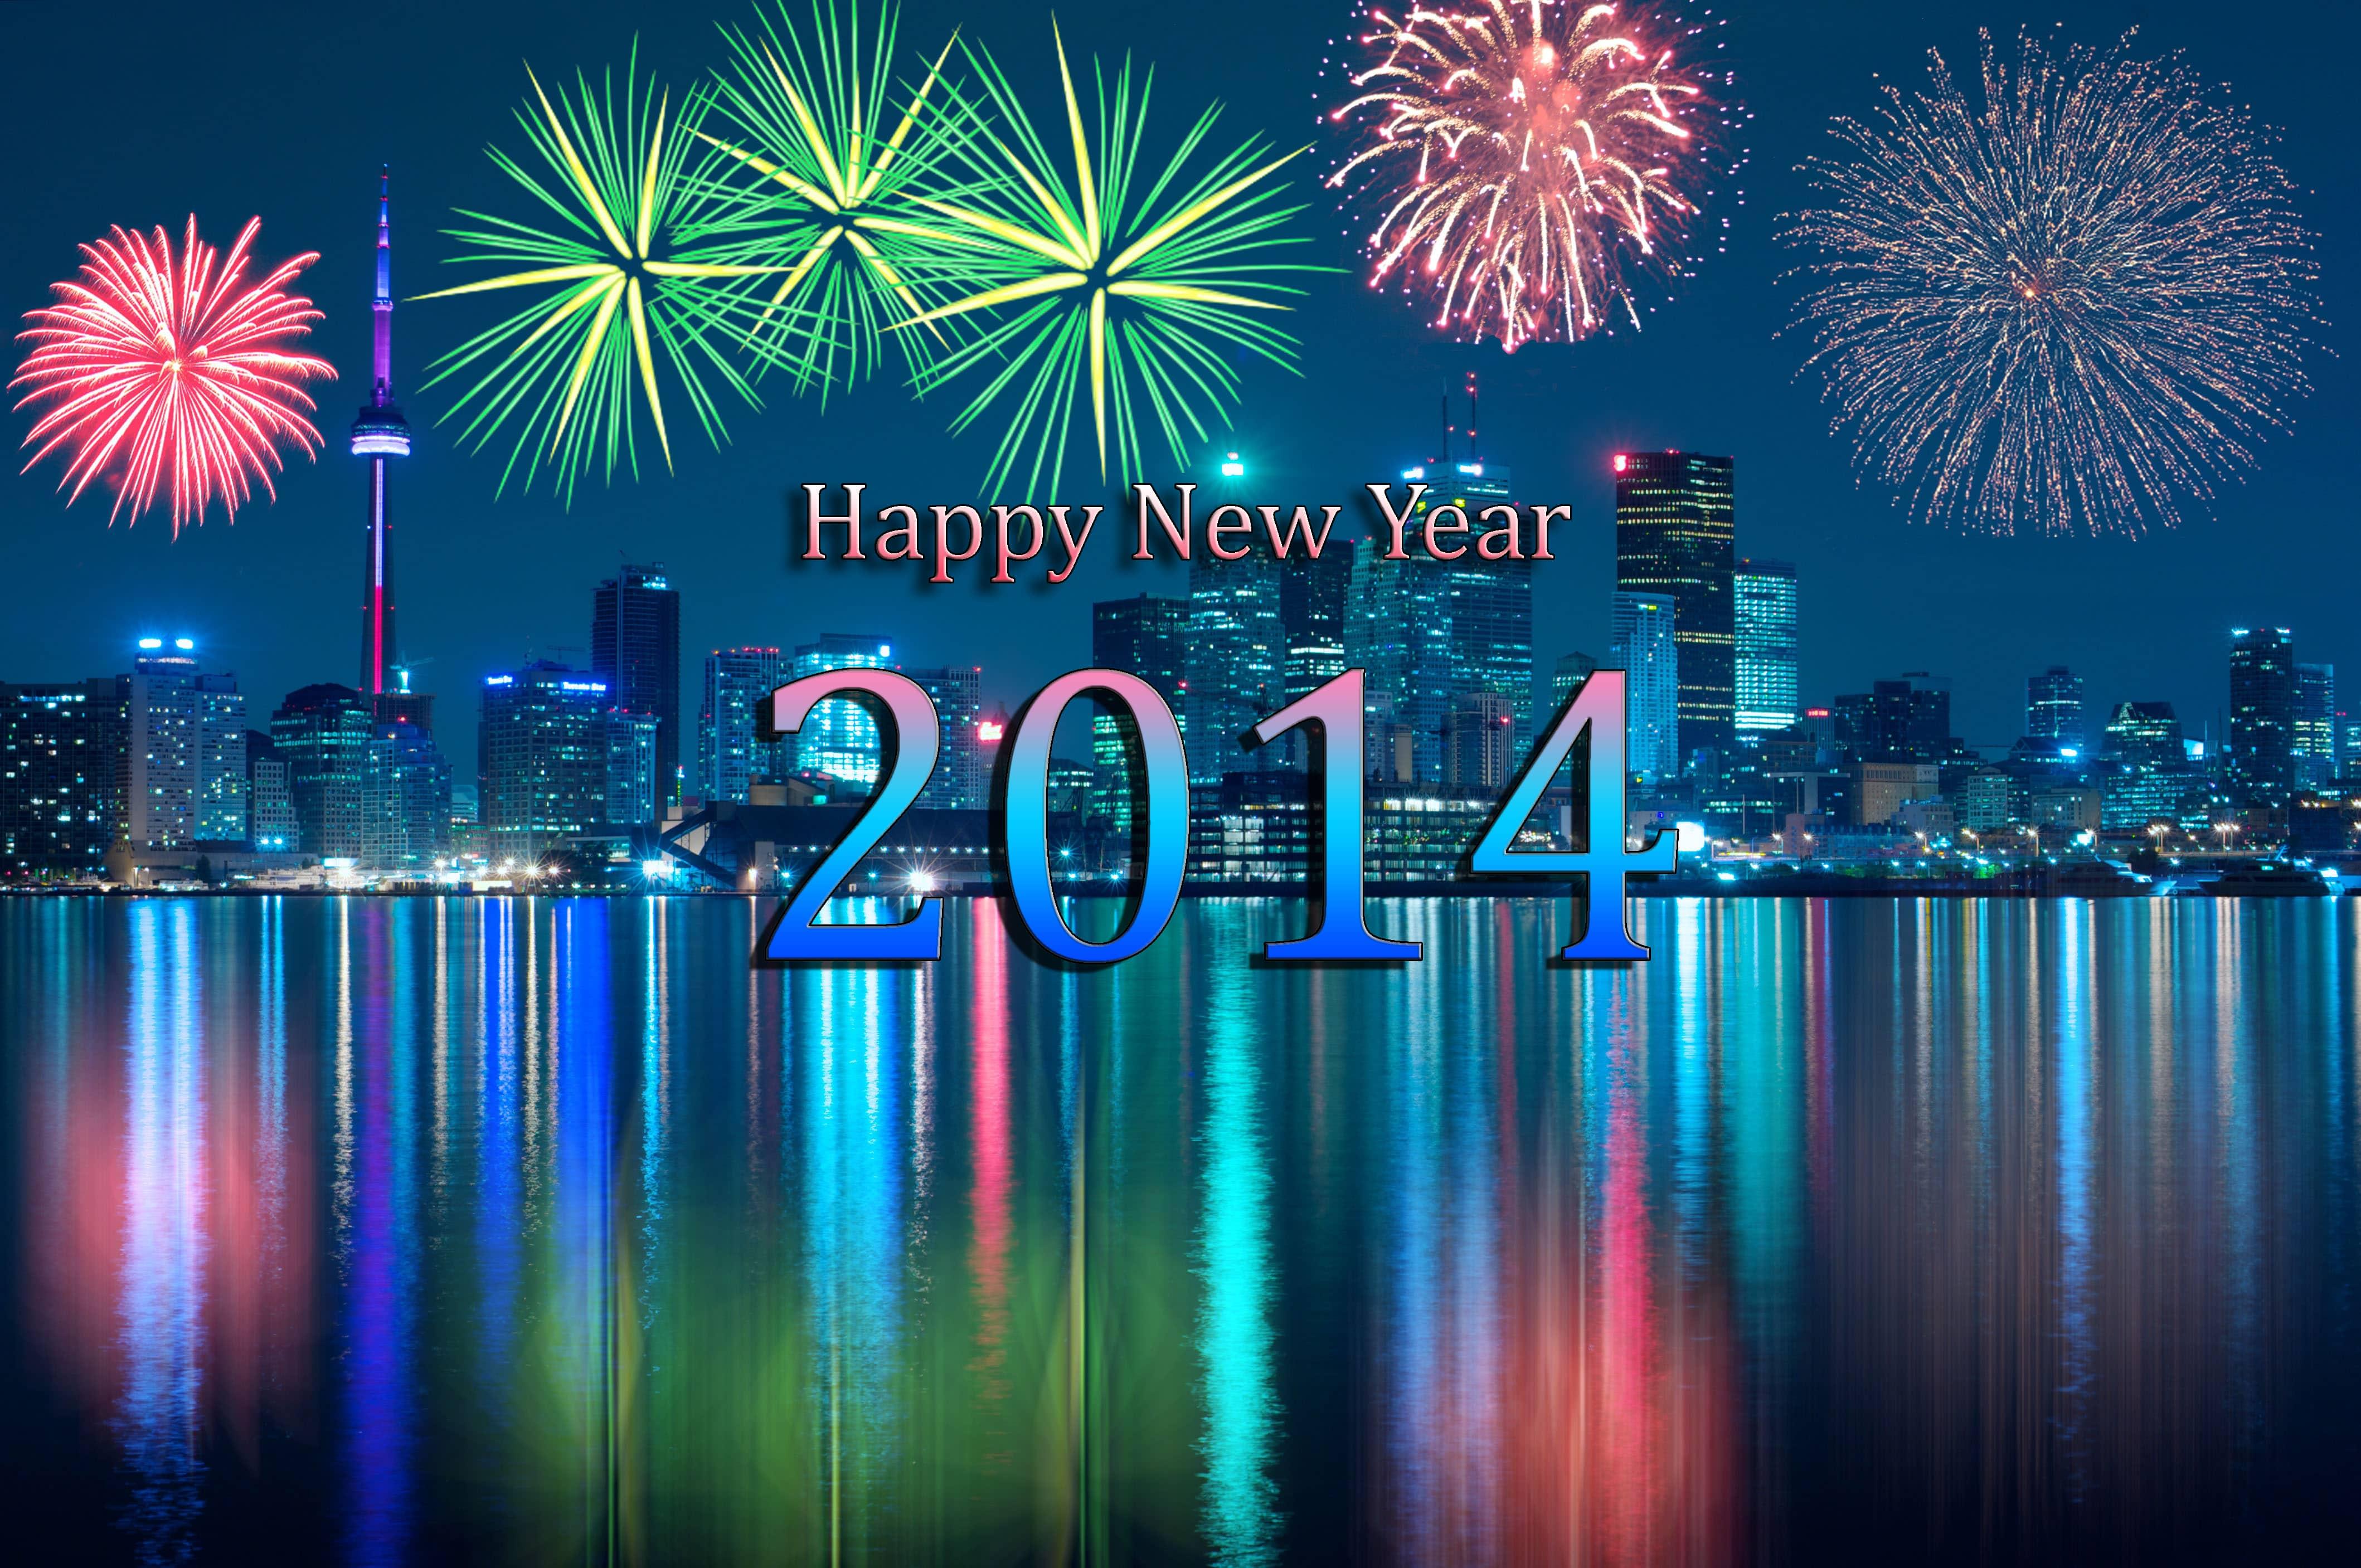 Un an nou cât mai bun!